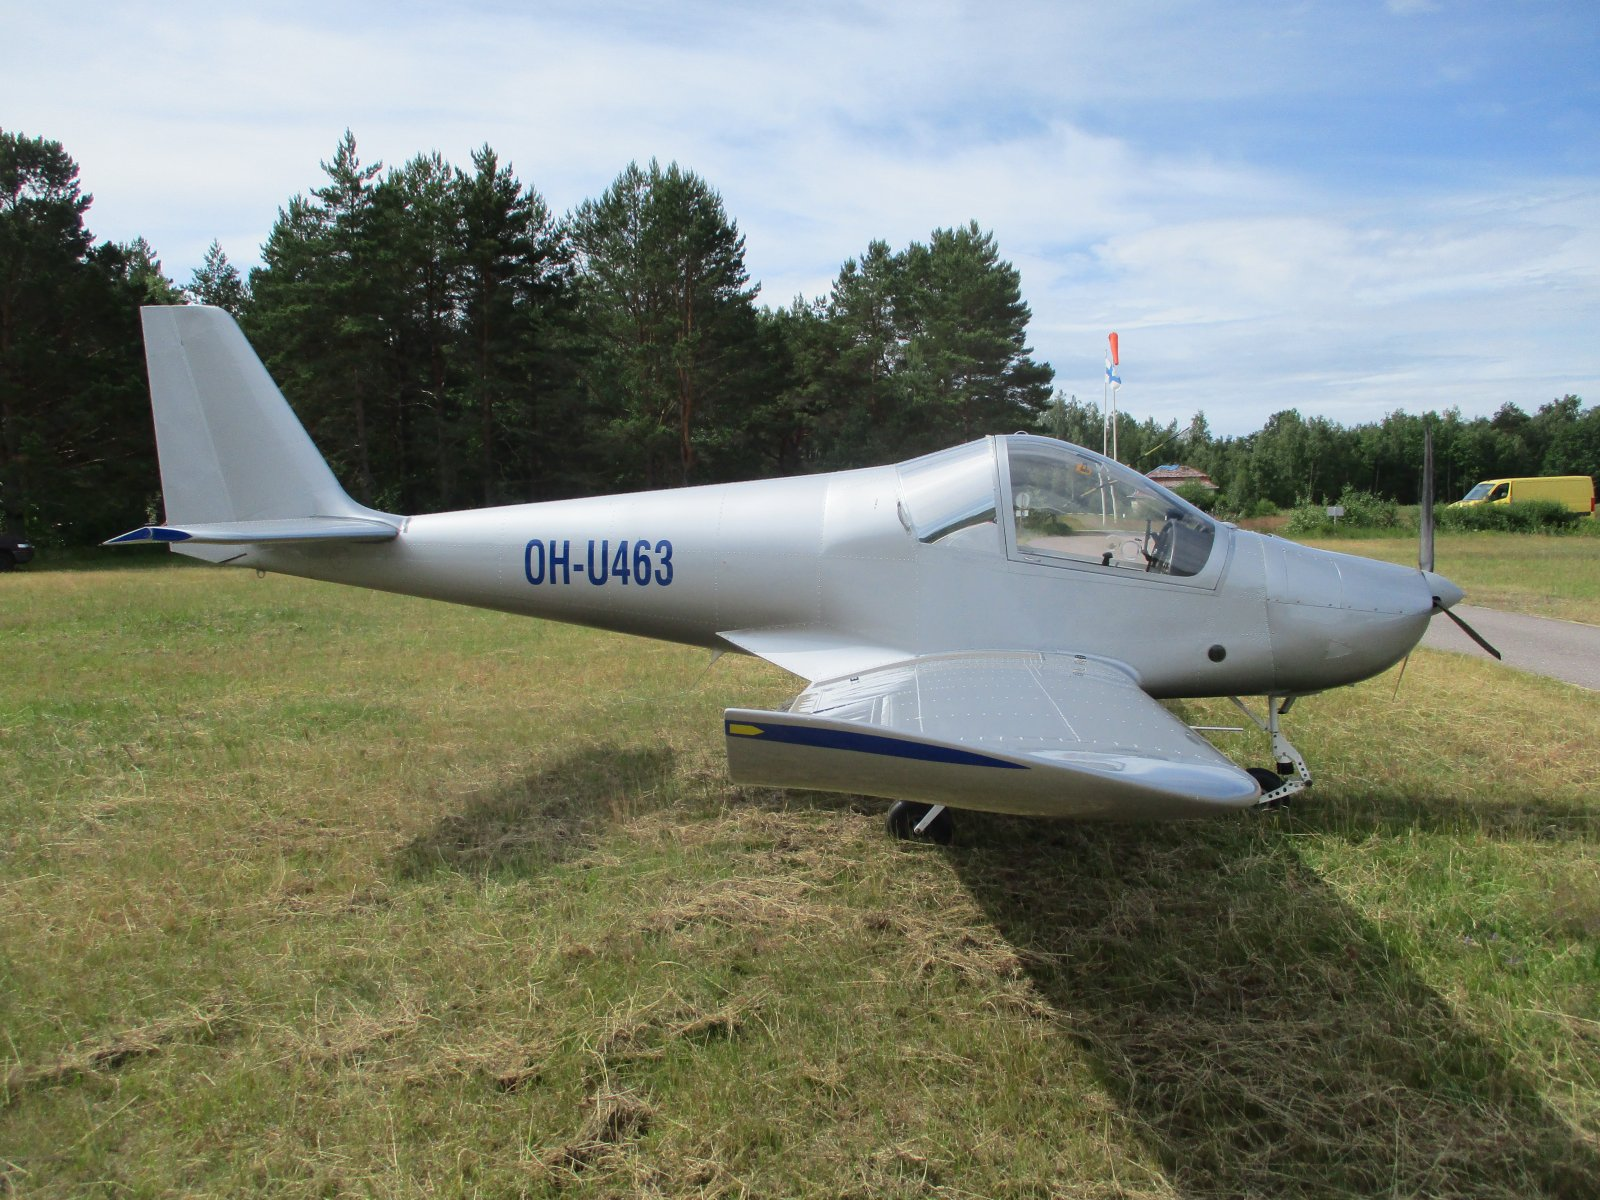 Kappa 77 KP-2U Sova OH-U463 EFHN 2019-06-29